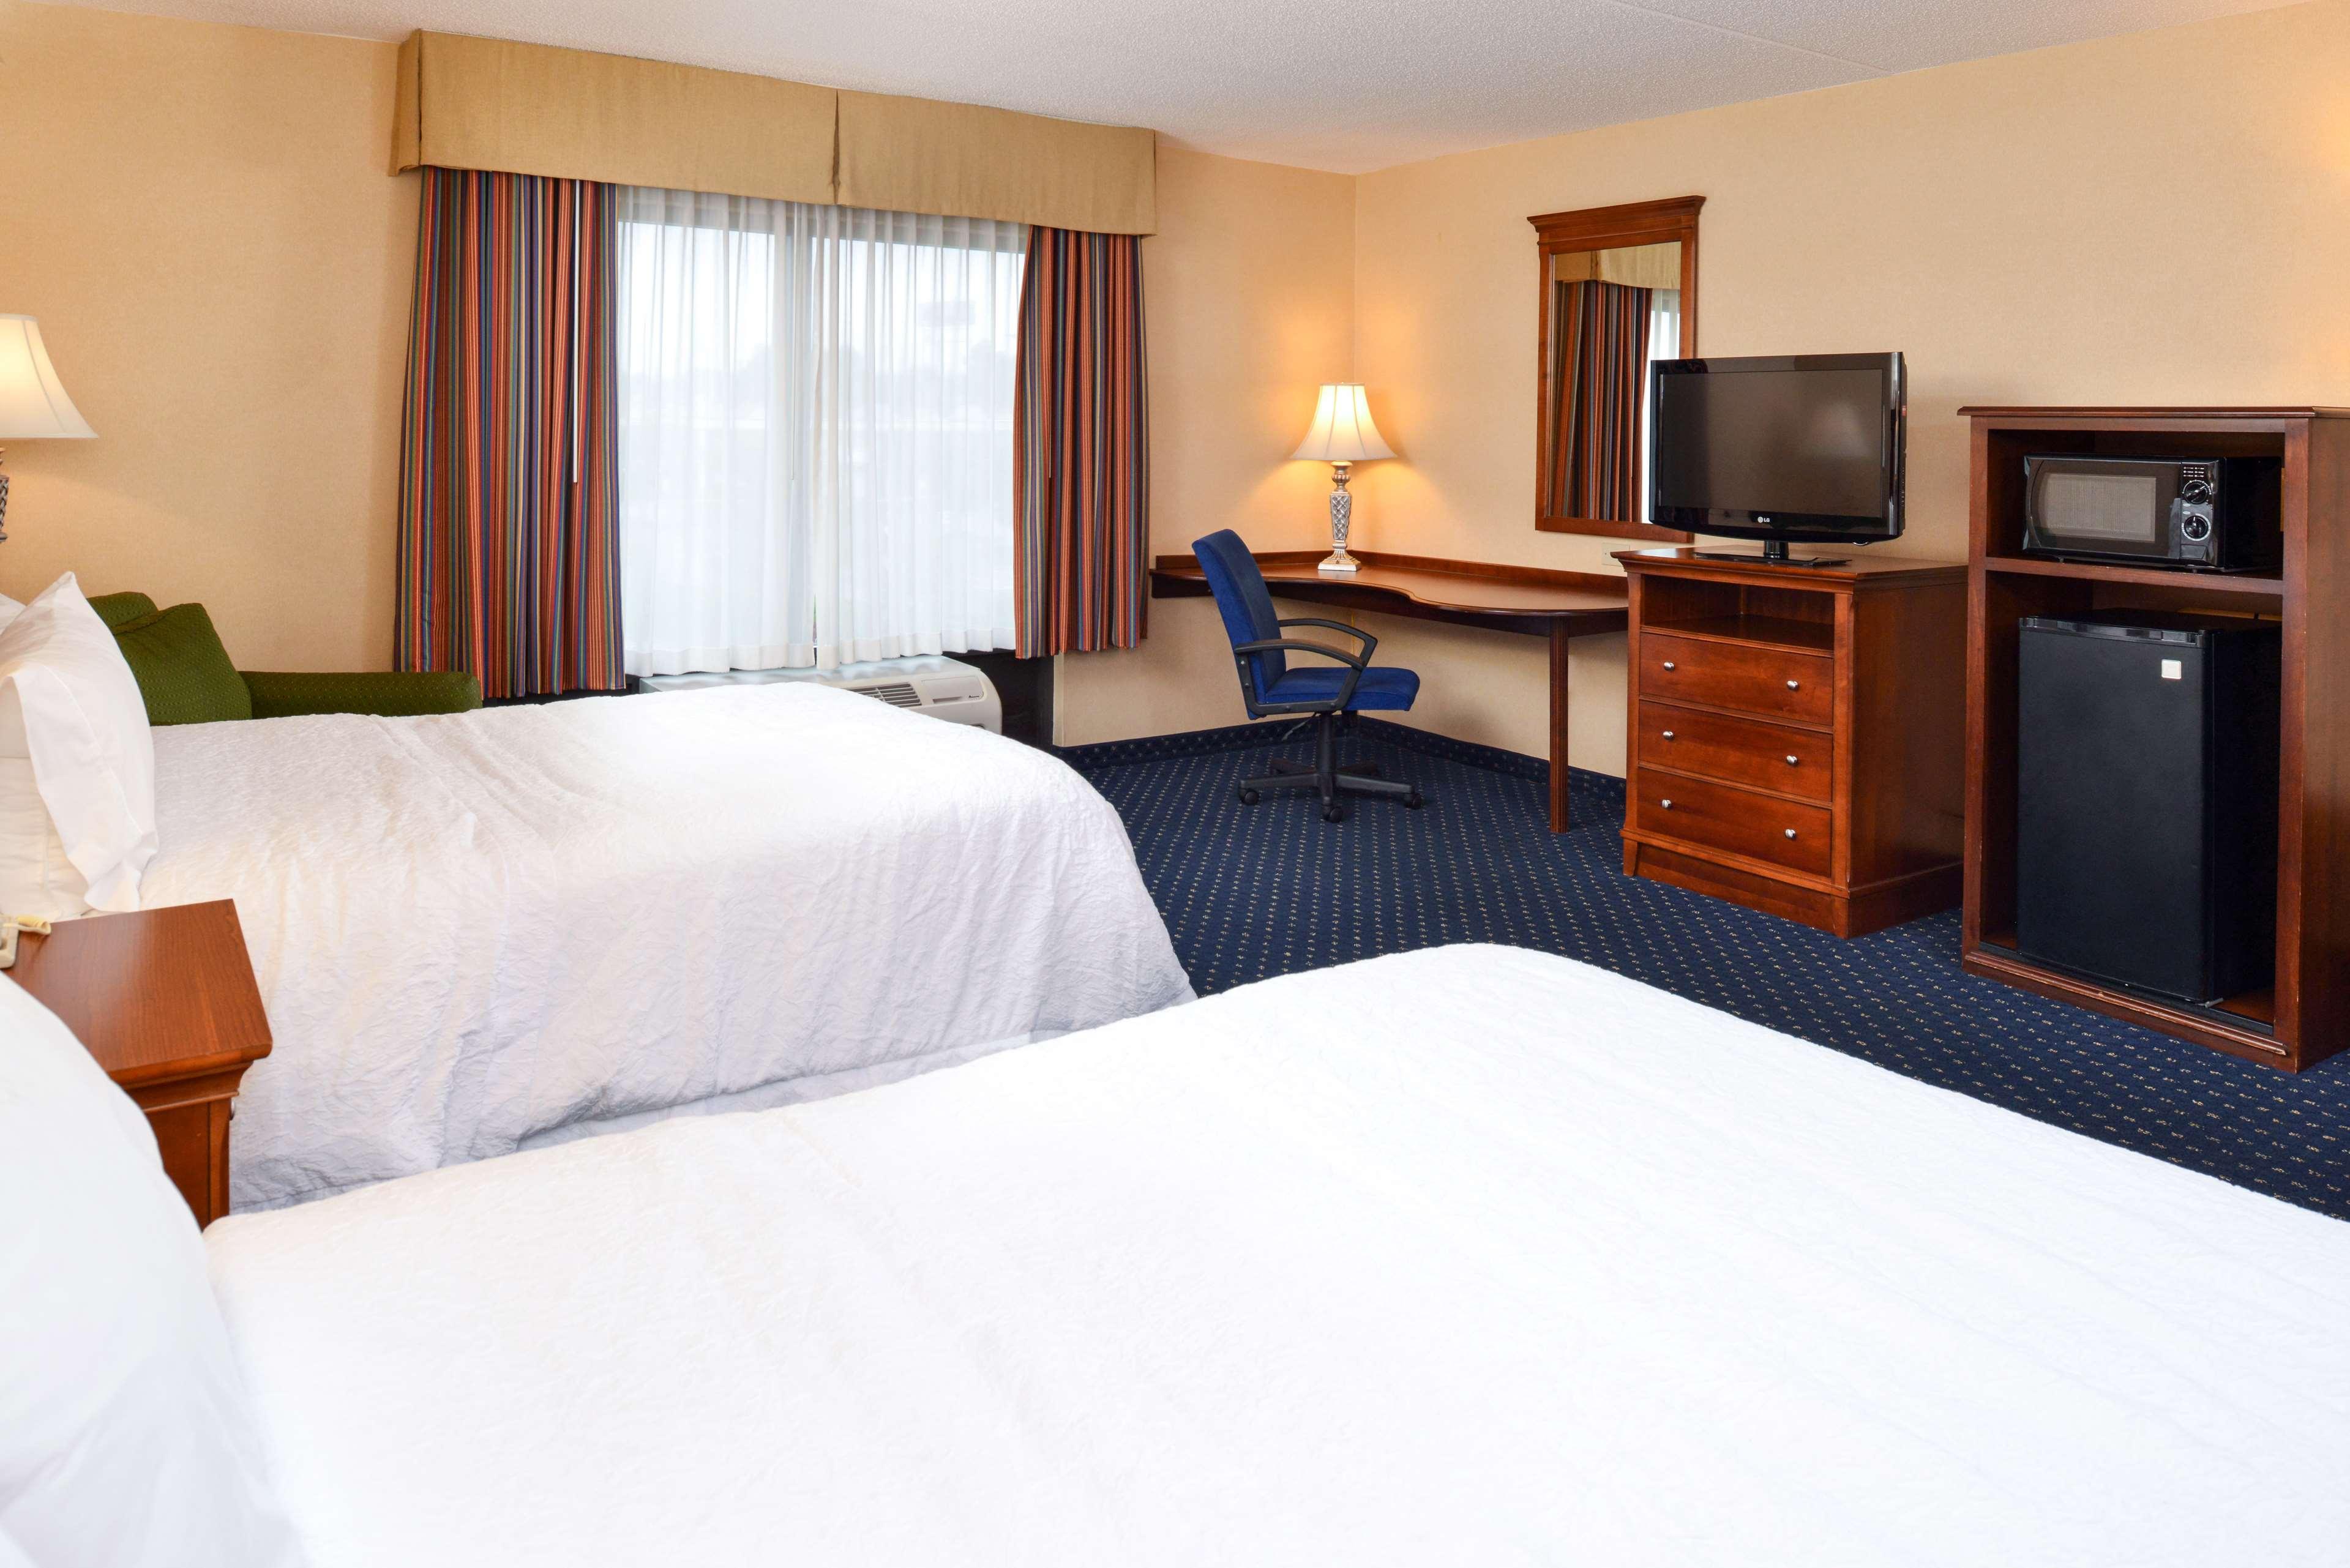 Hampton Inn & Suites Fredericksburg South image 35